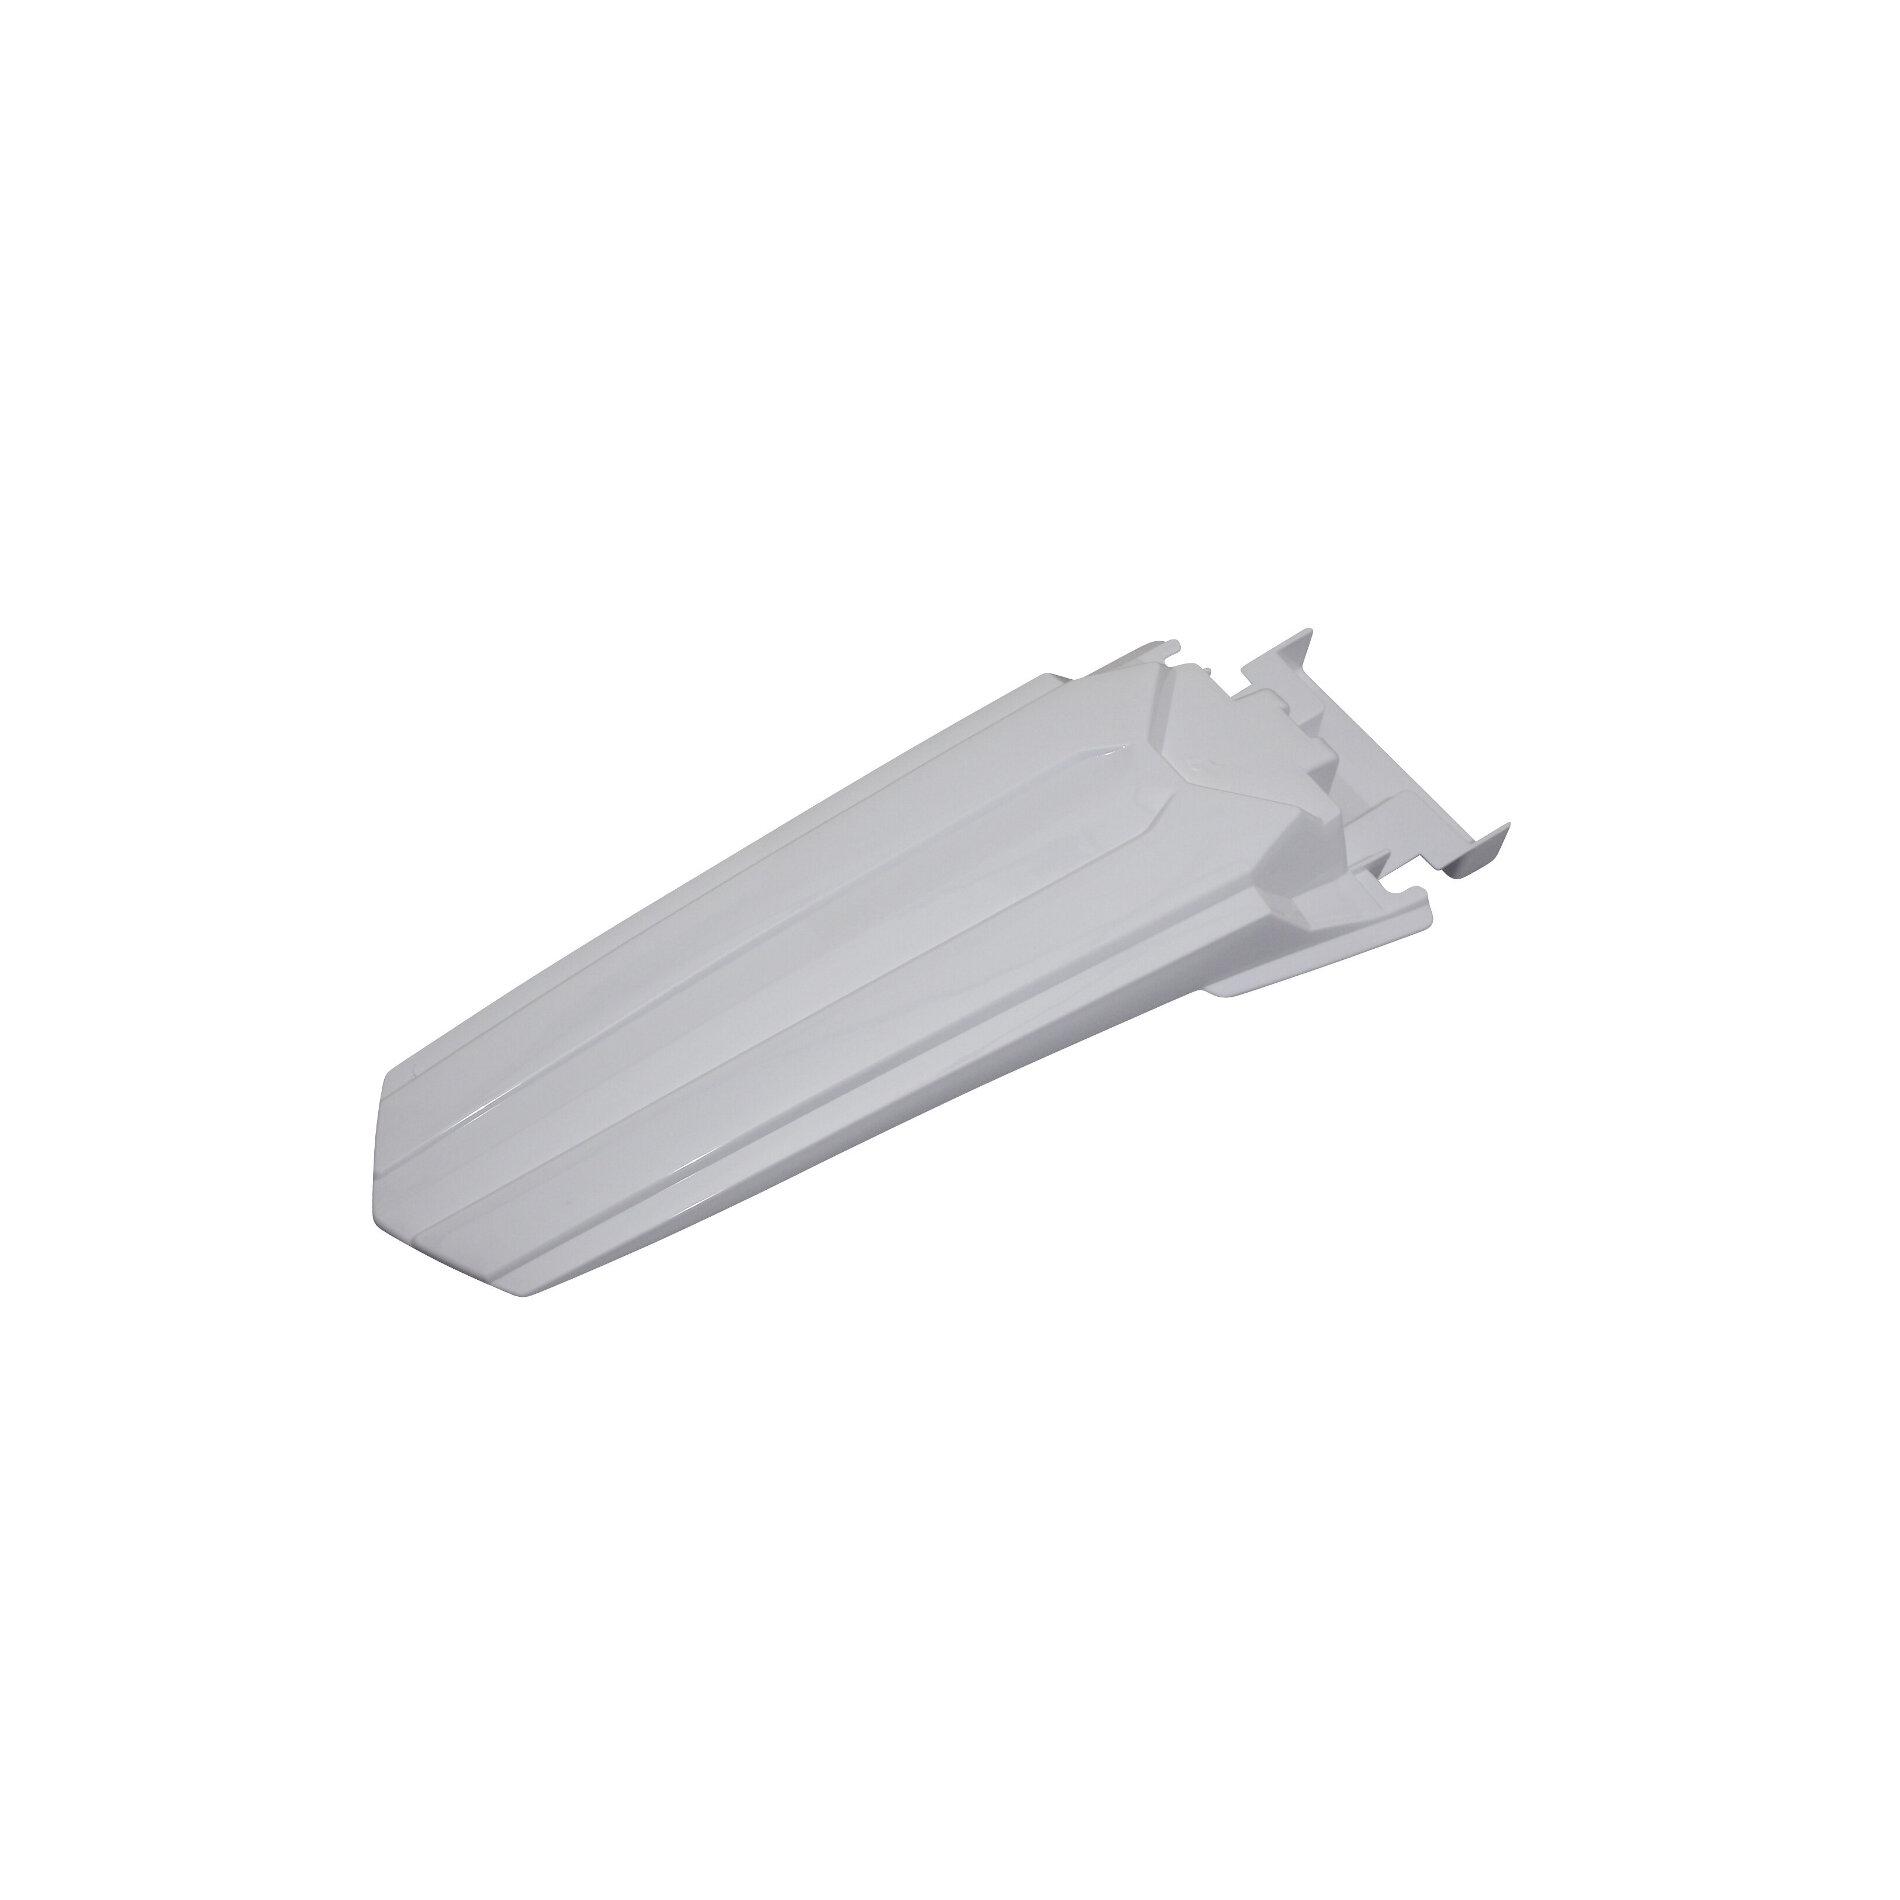 Garde boue arrière Rieju 50 MRT / MRT Pro 09- blanc brillant